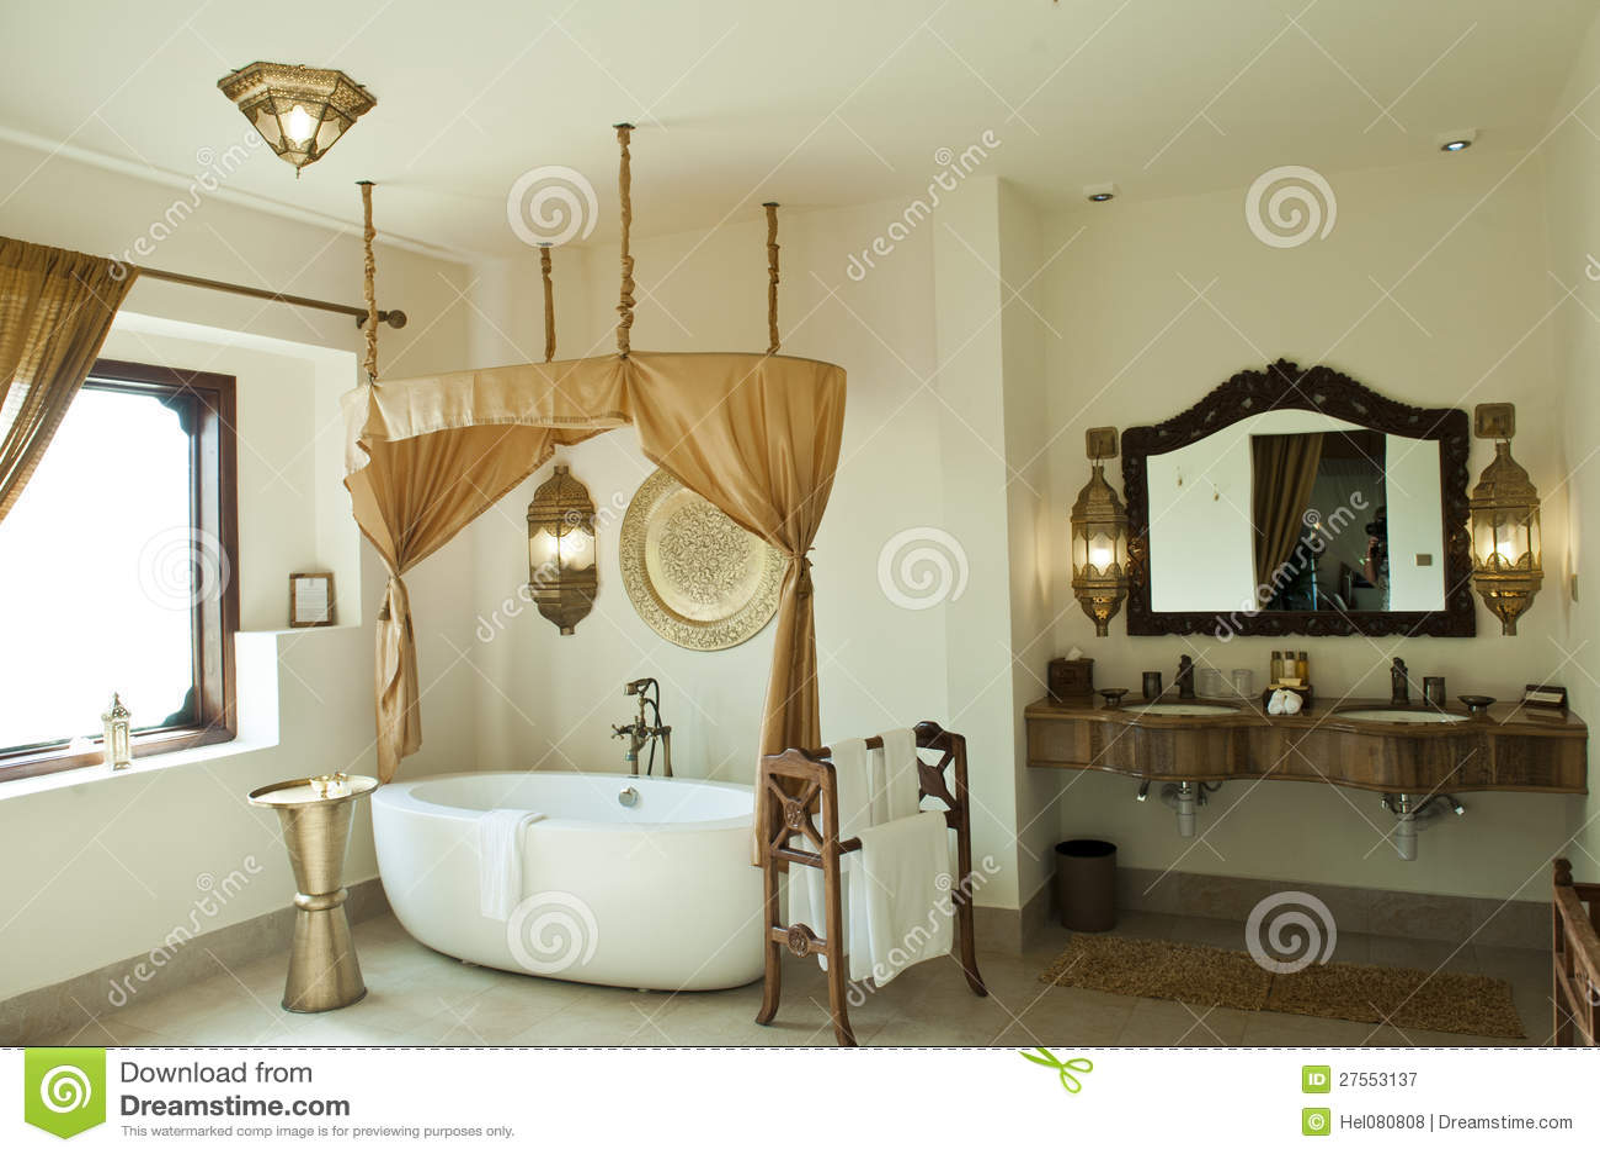 Salle De Bain Luxe Hotel ~ salle de bains orientale de luxe d h tel image stock image du